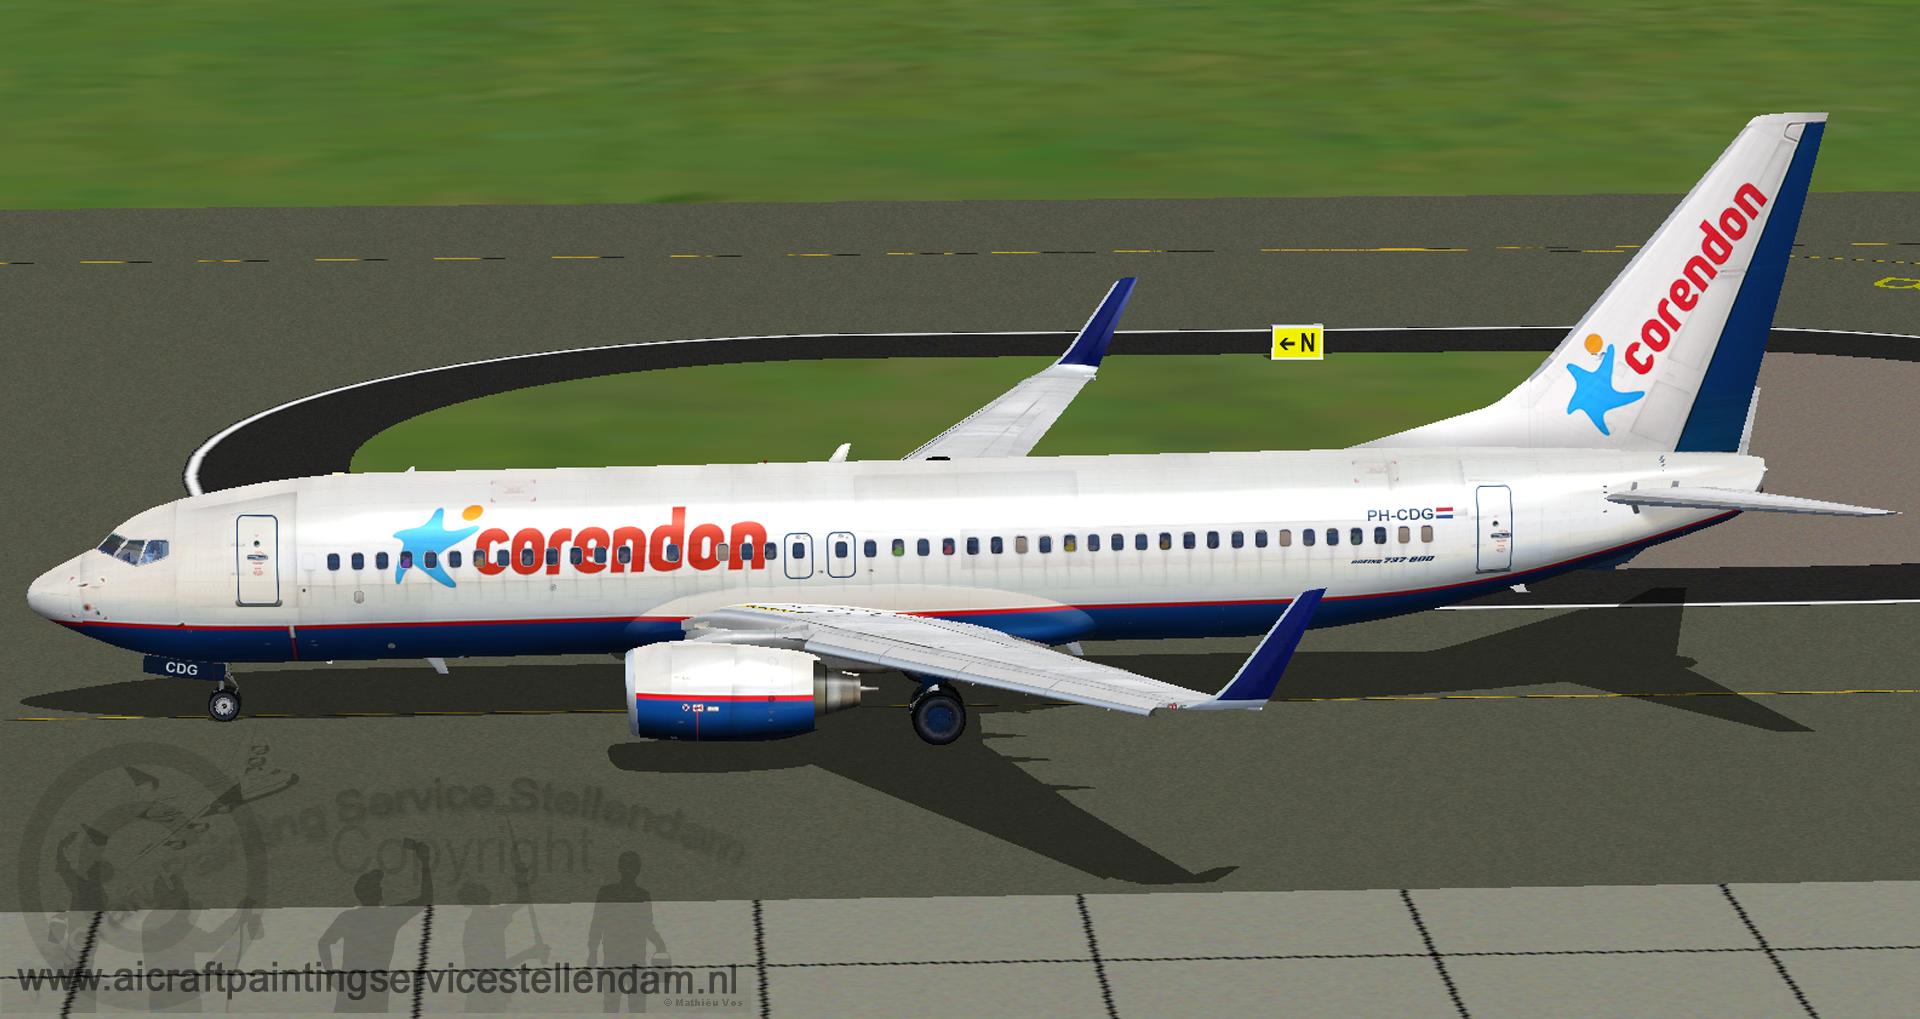 TDSB737-800CorendonDutchAirlines_OrenairHybrid_PH-CDG